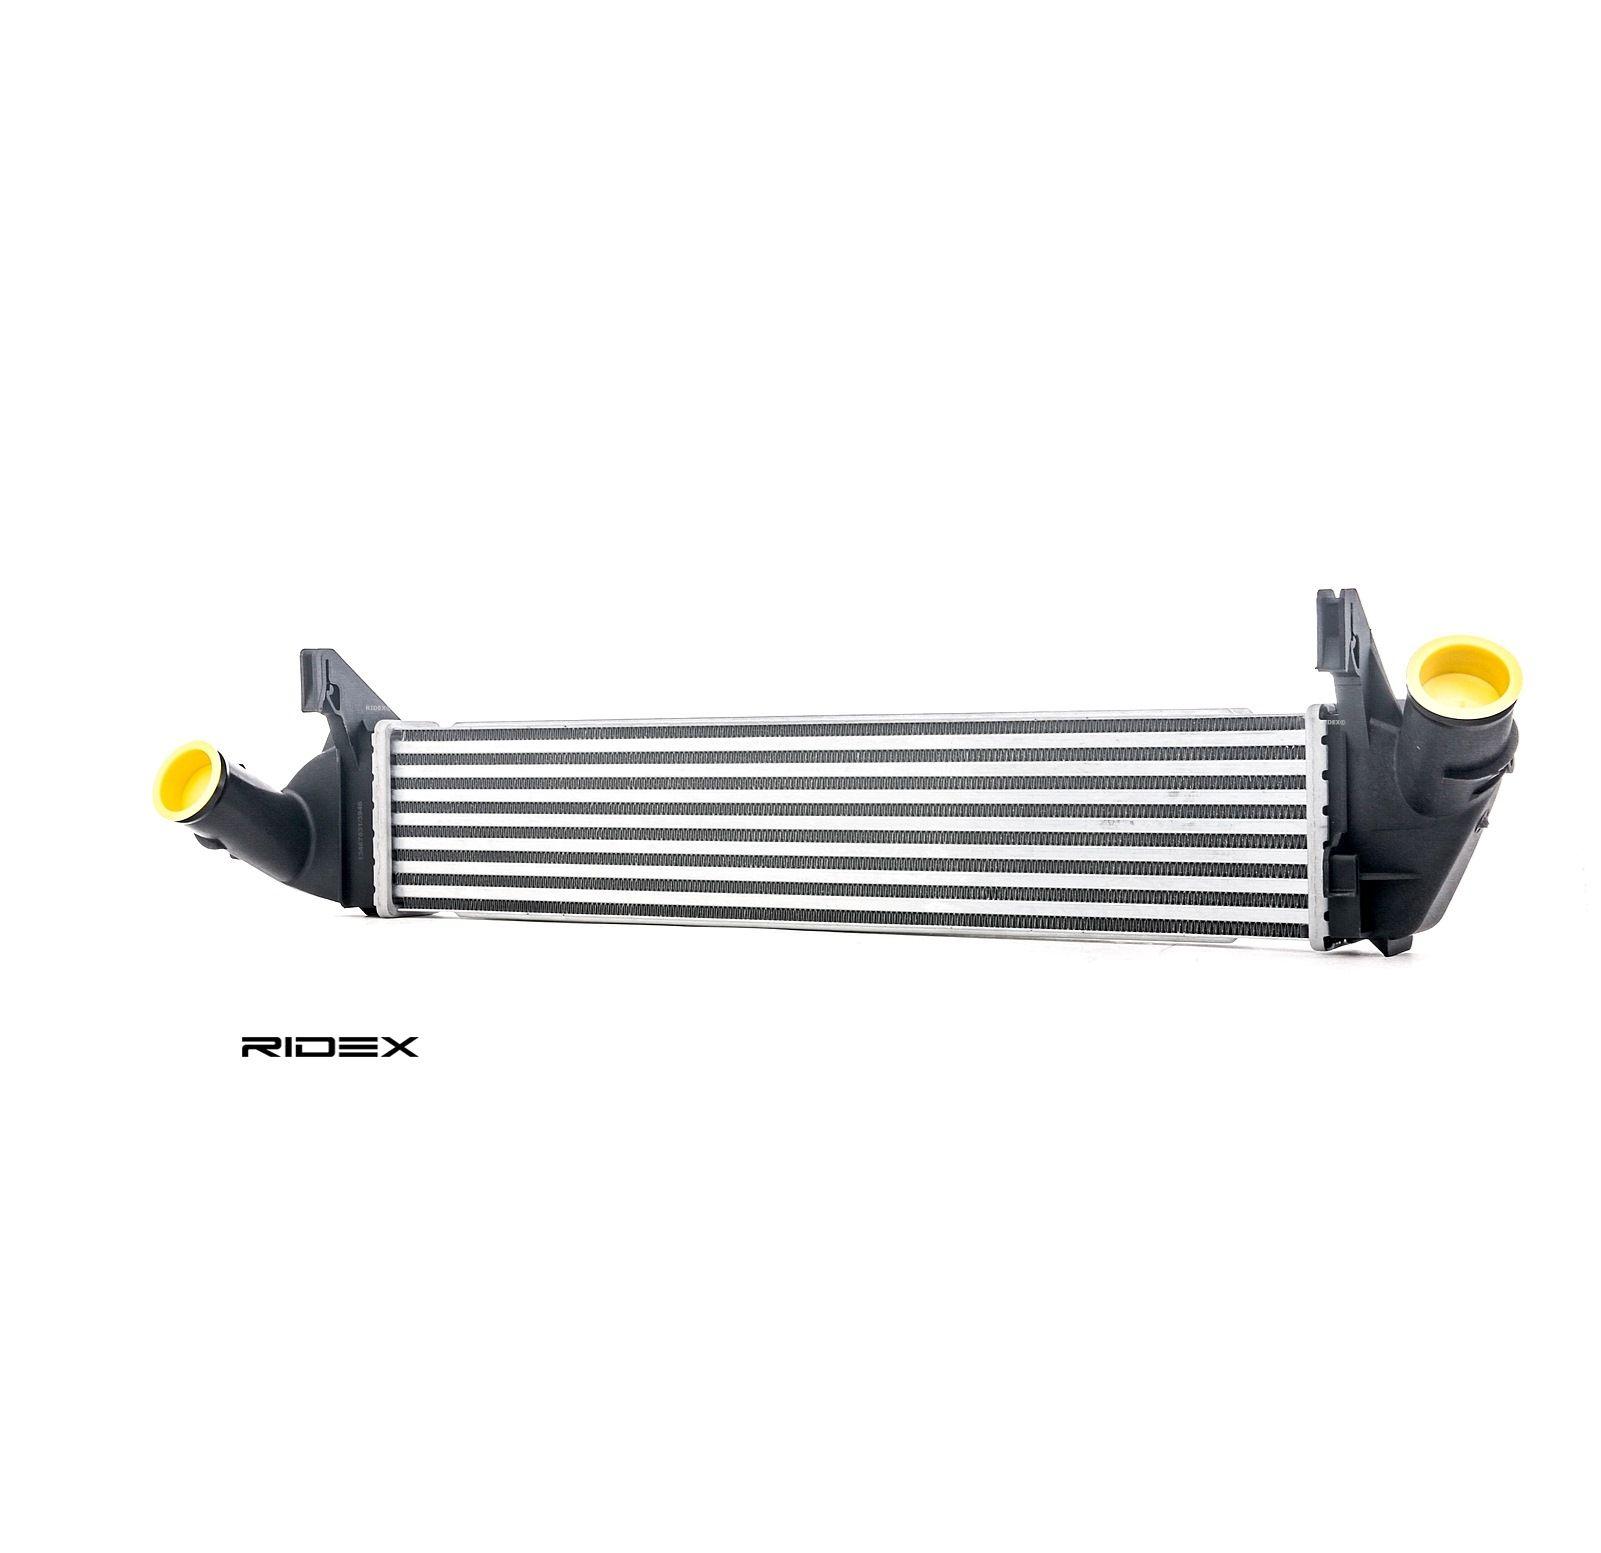 ridex Intercooler RENAULT,DACIA 468I0063 8200409045 Interkoeler, tussenkoeler